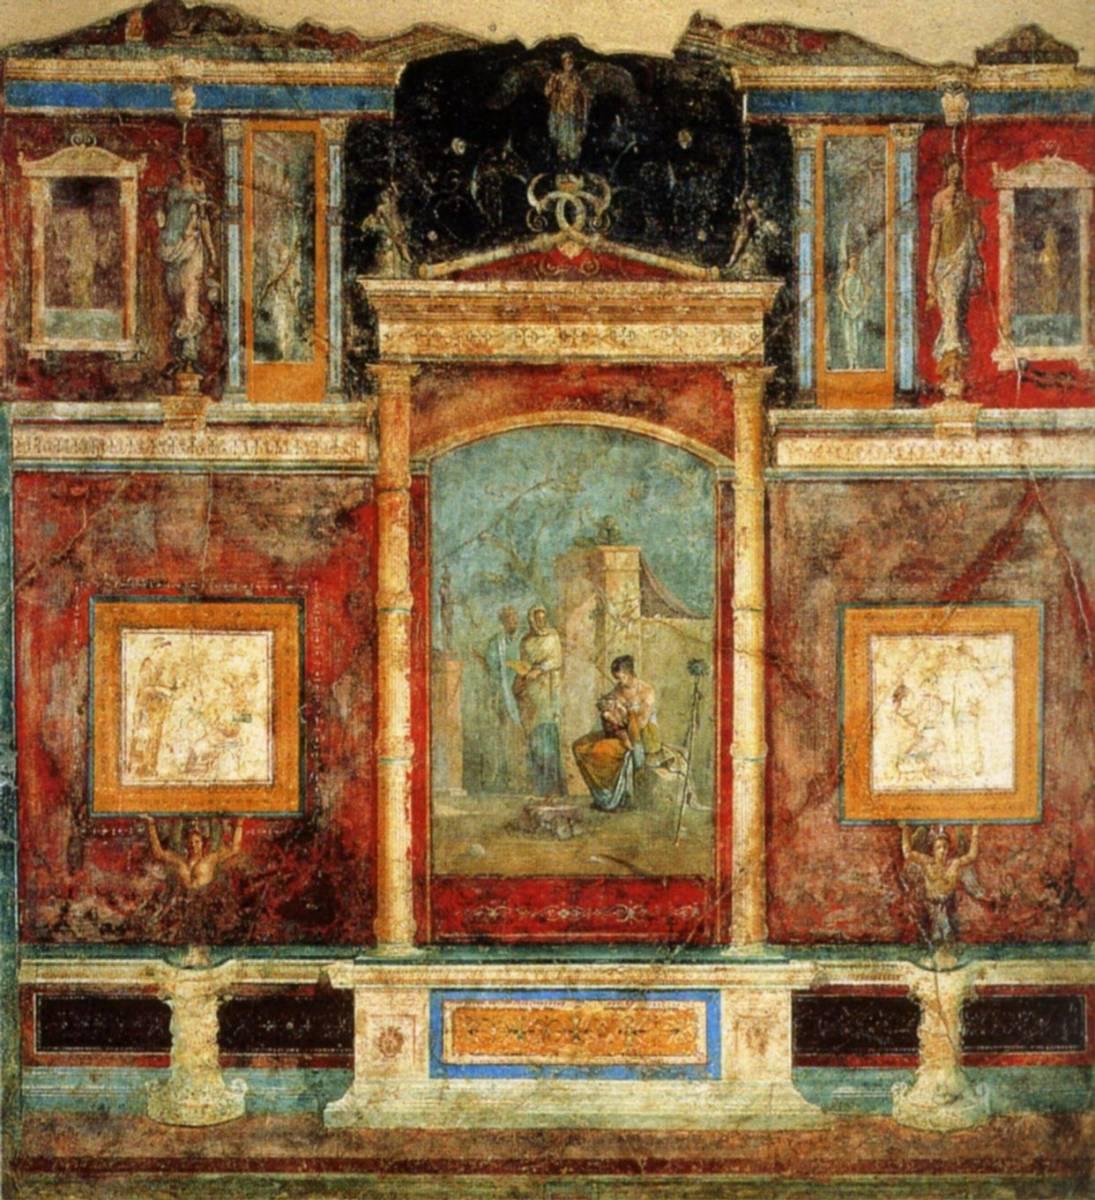 20 peinture murale du second style rome villa de la farnesine mural. Black Bedroom Furniture Sets. Home Design Ideas